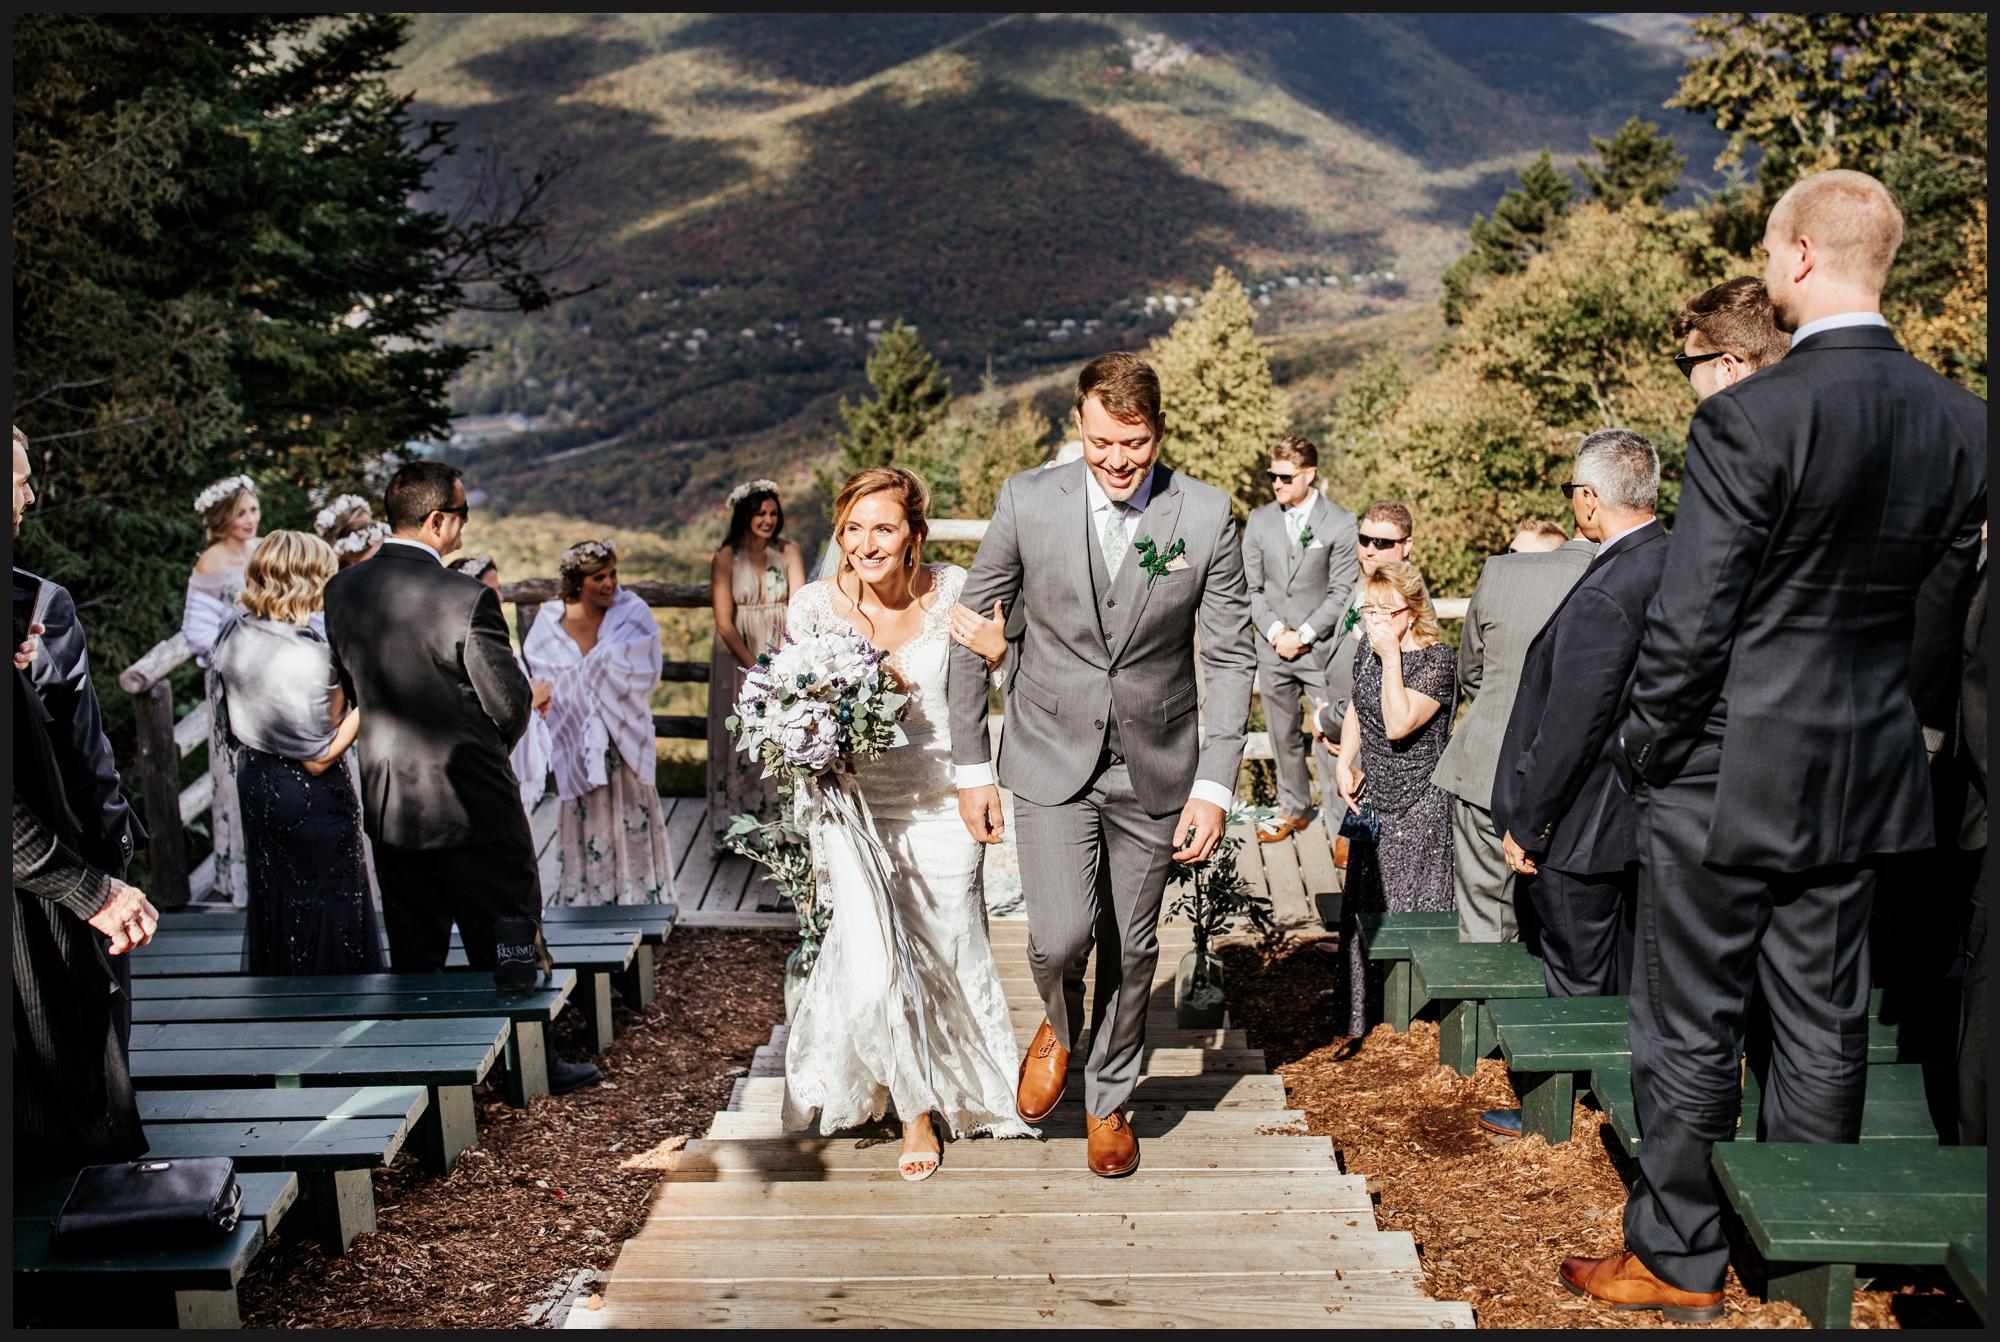 Orlando-Wedding-Photographer-destination-wedding-photographer-florida-wedding-photographer-hawaii-wedding-photographer_0143.jpg